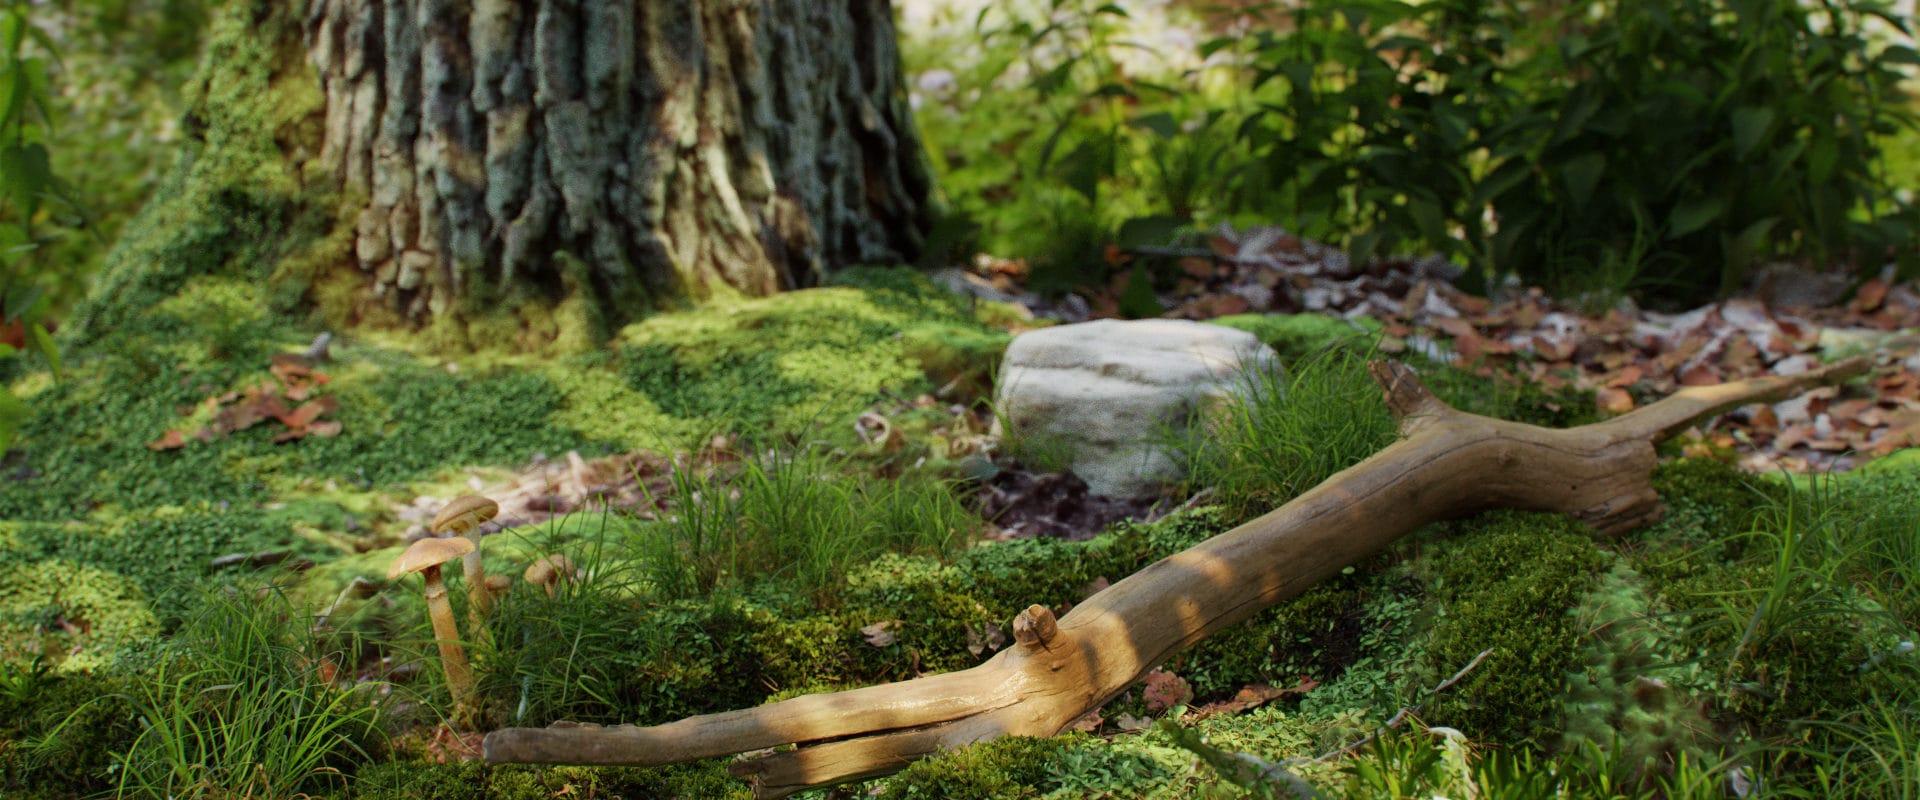 Wood_piece_360_17_13